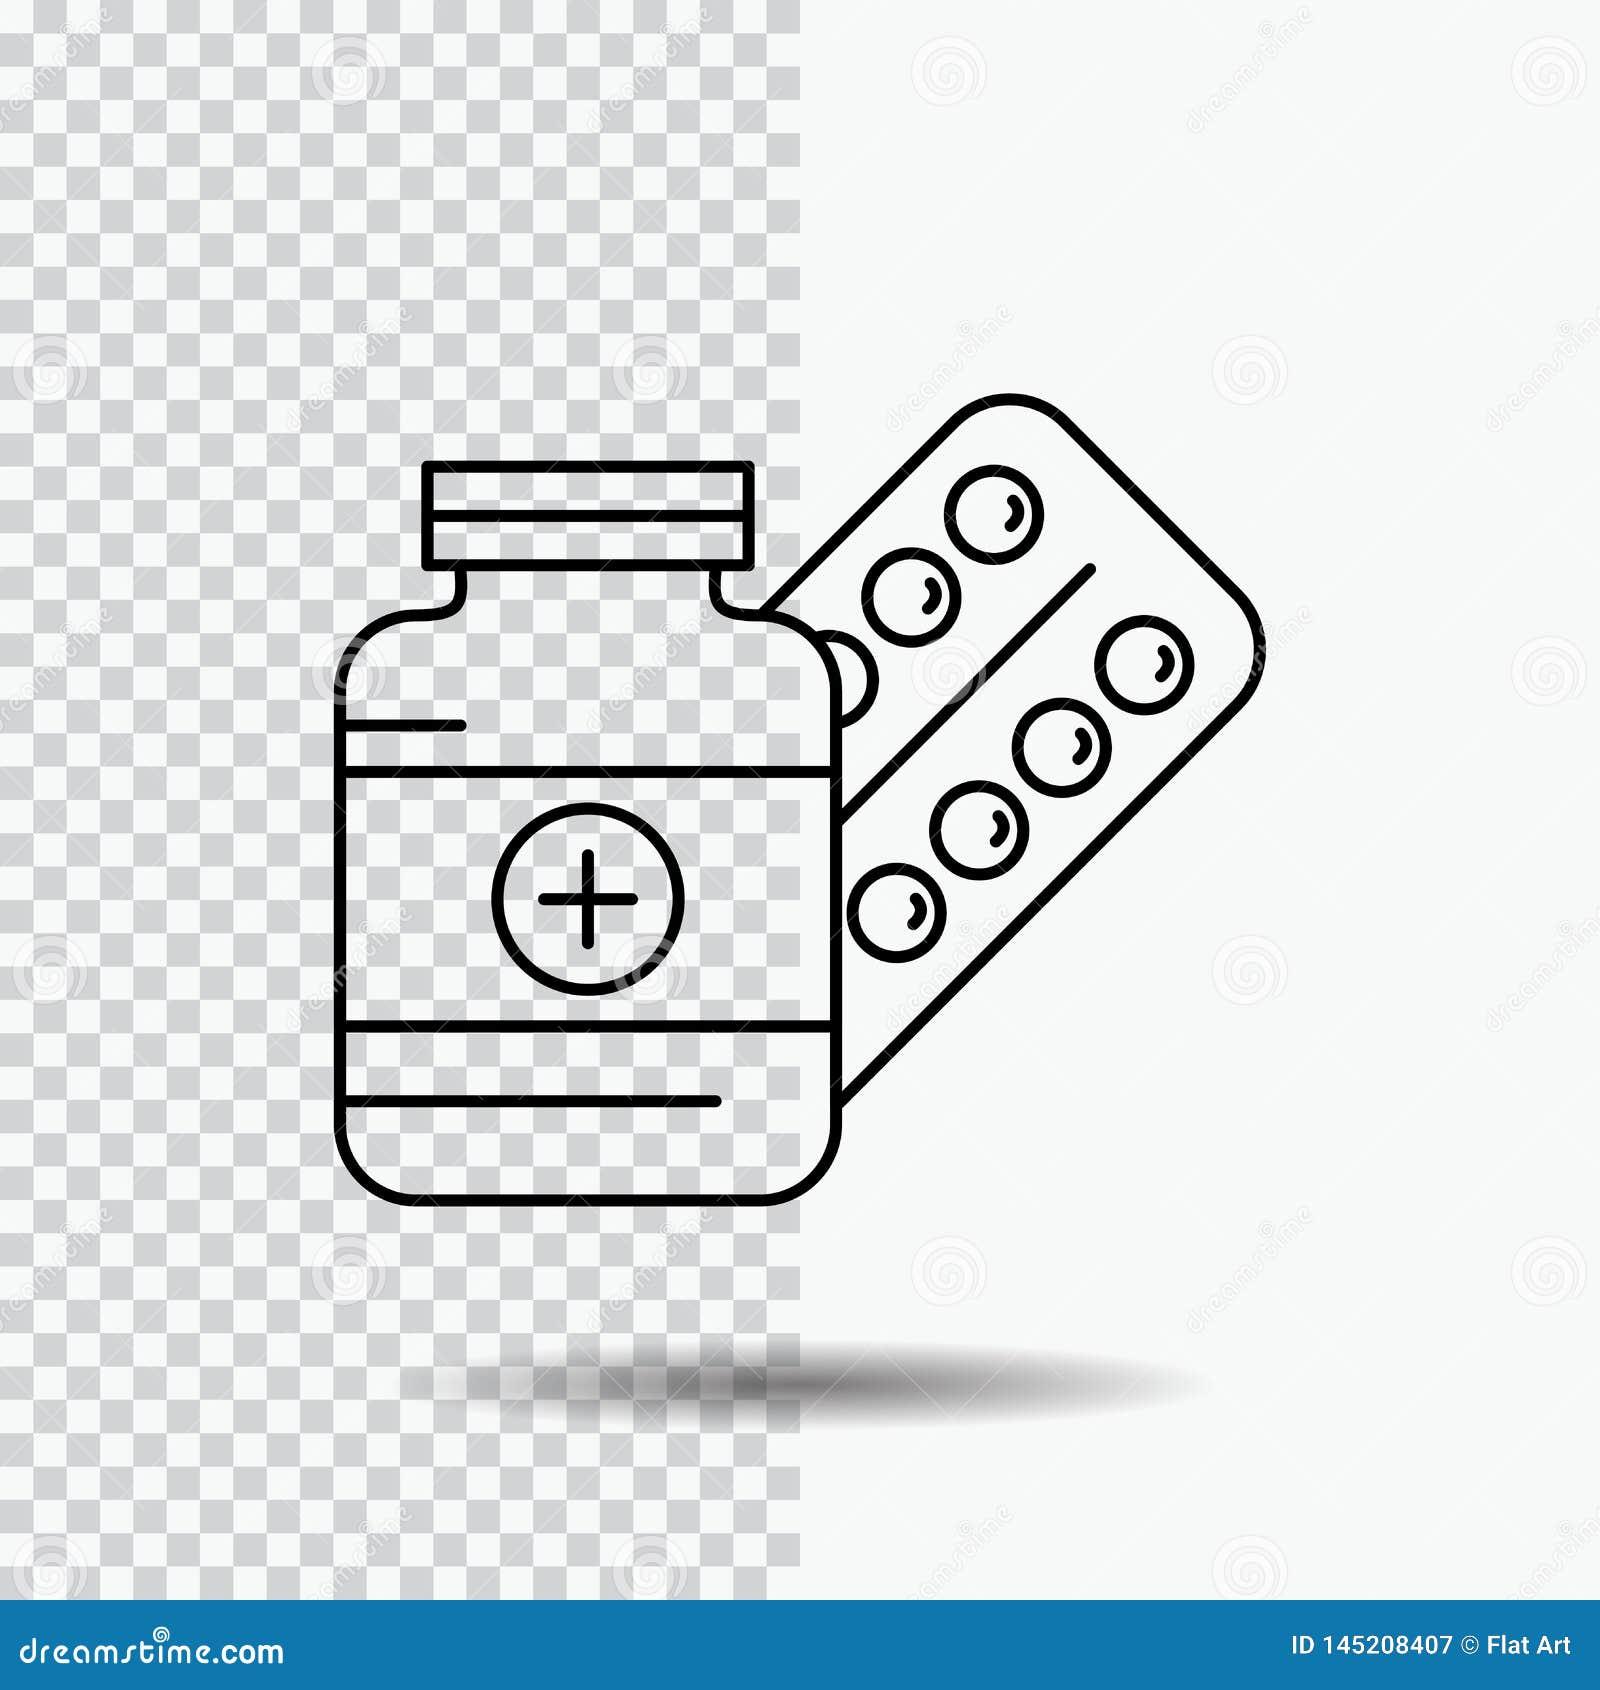 медицина, таблетка, капсула, лекарства, линия значок планшета на прозрачной предпосылке r